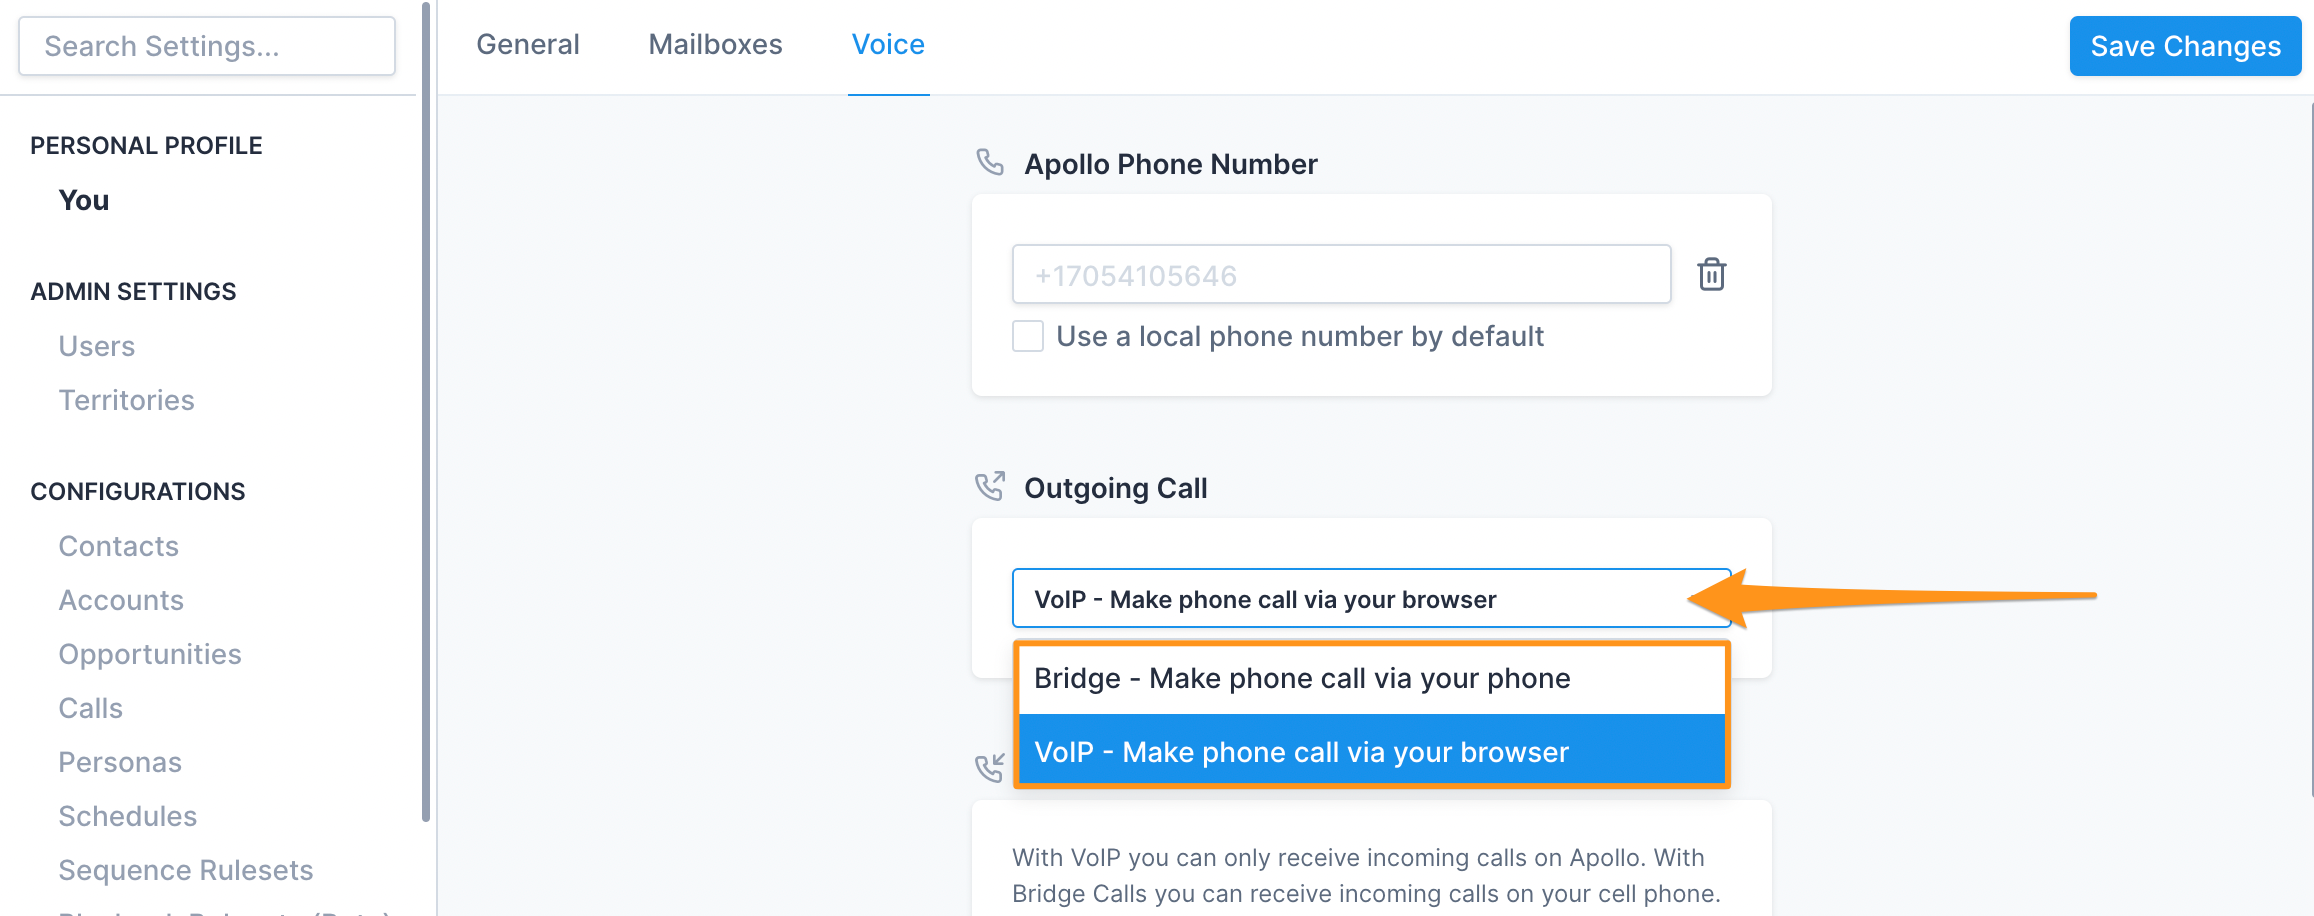 Call Options